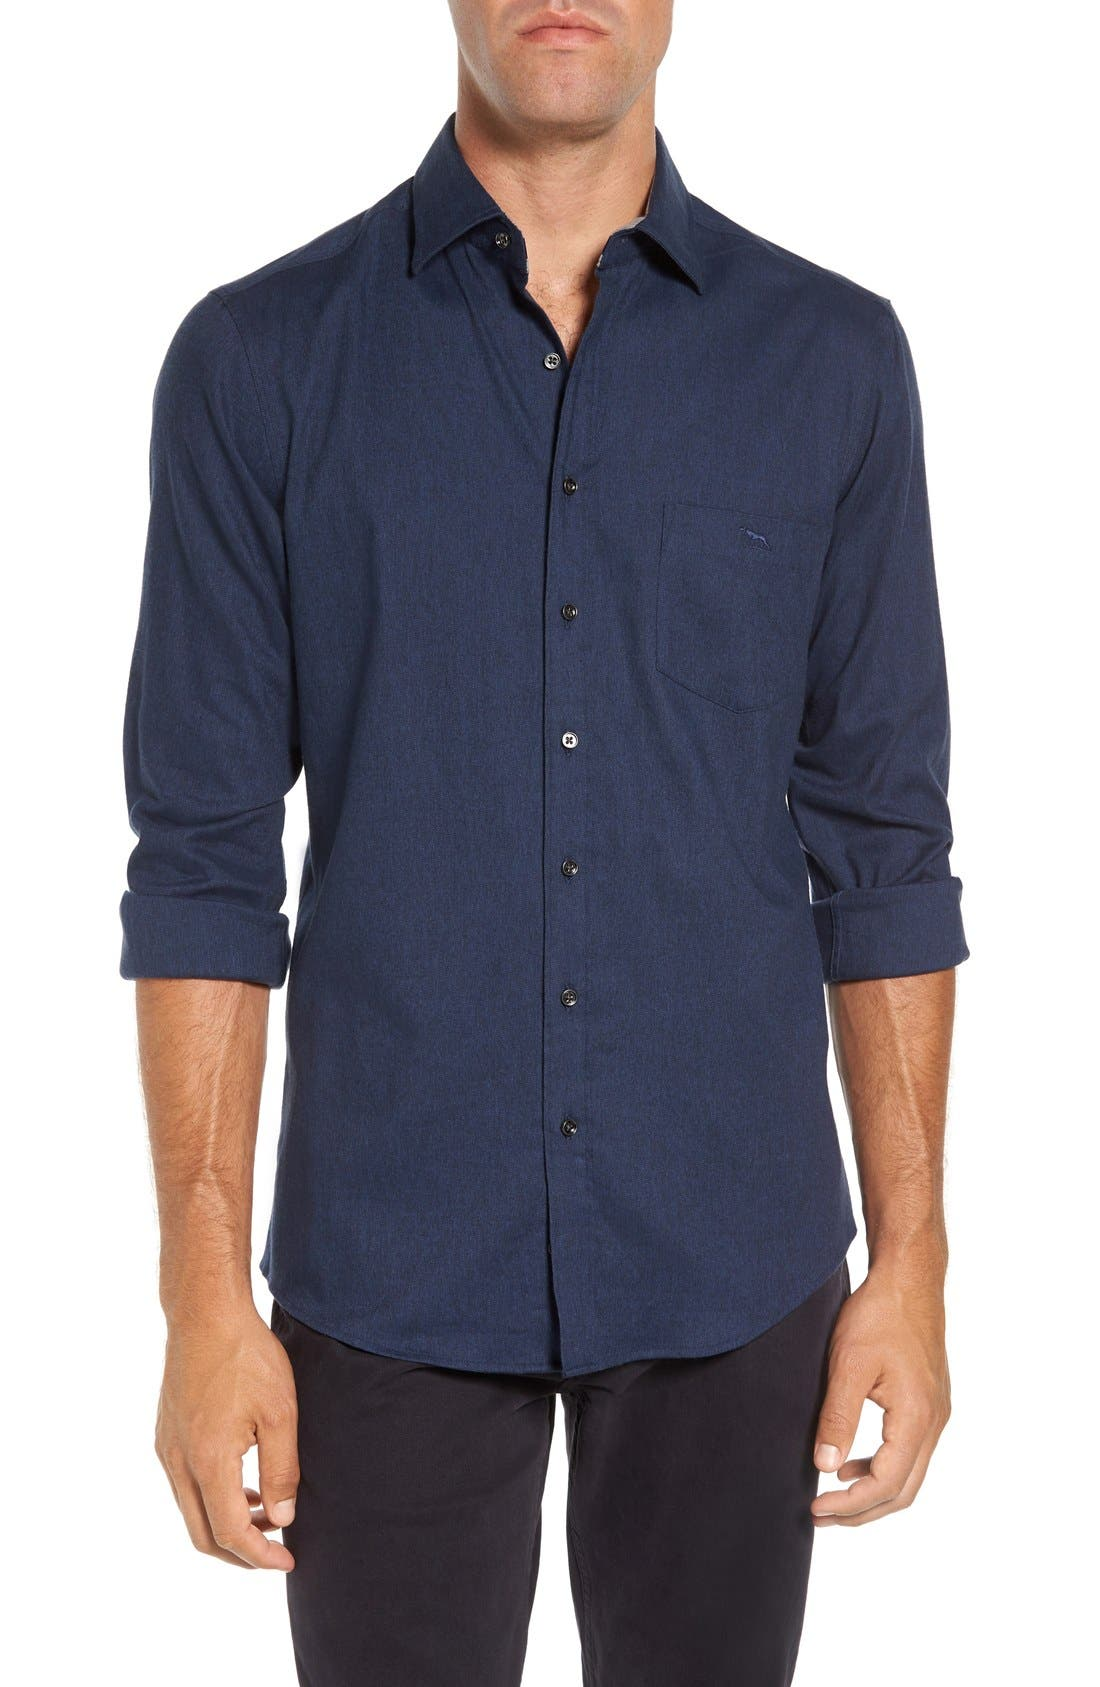 'Sinclair' Trim Fit Brushed Twill Sport Shirt,                         Main,                         color, Indigo